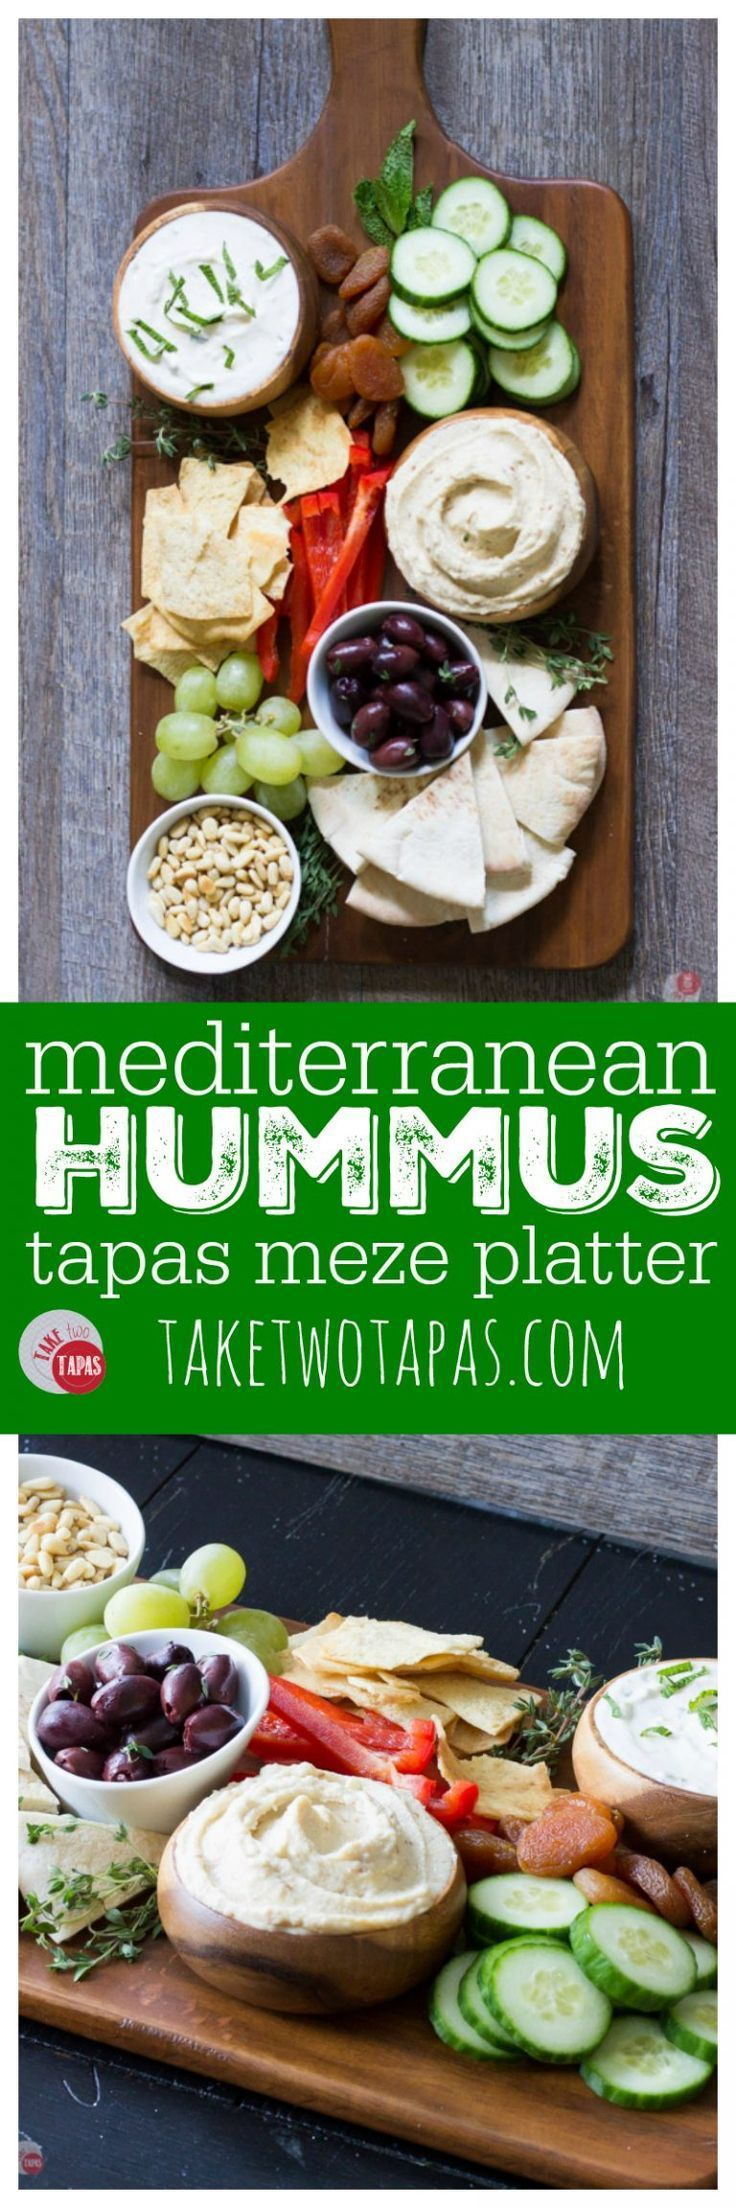 Hummus Meze Mediterranean Tapas Platter #appetizer #gameday #movienight